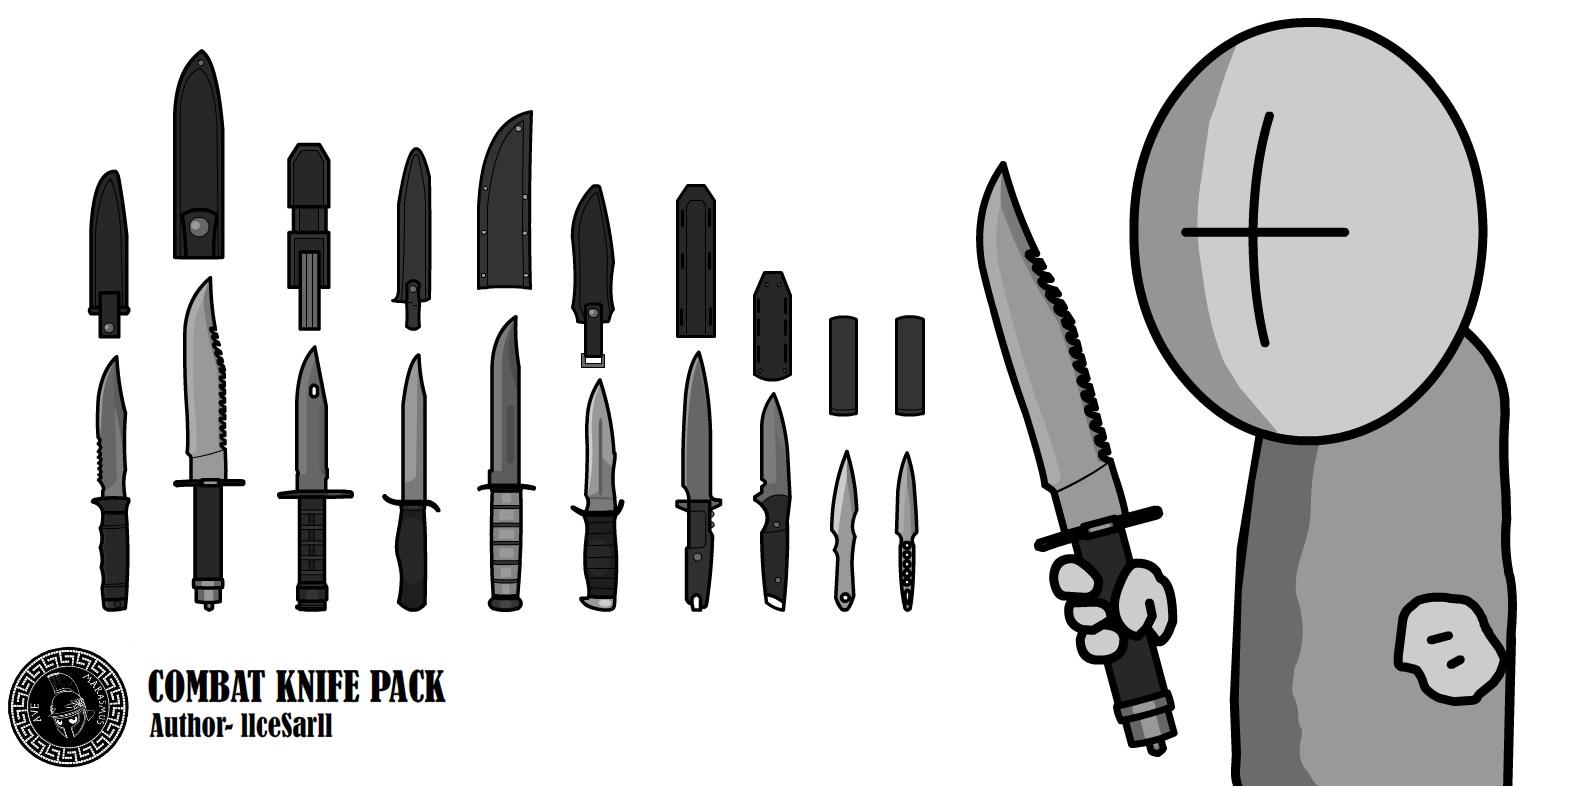 4313767_145270317092_Com.Knife.jpg